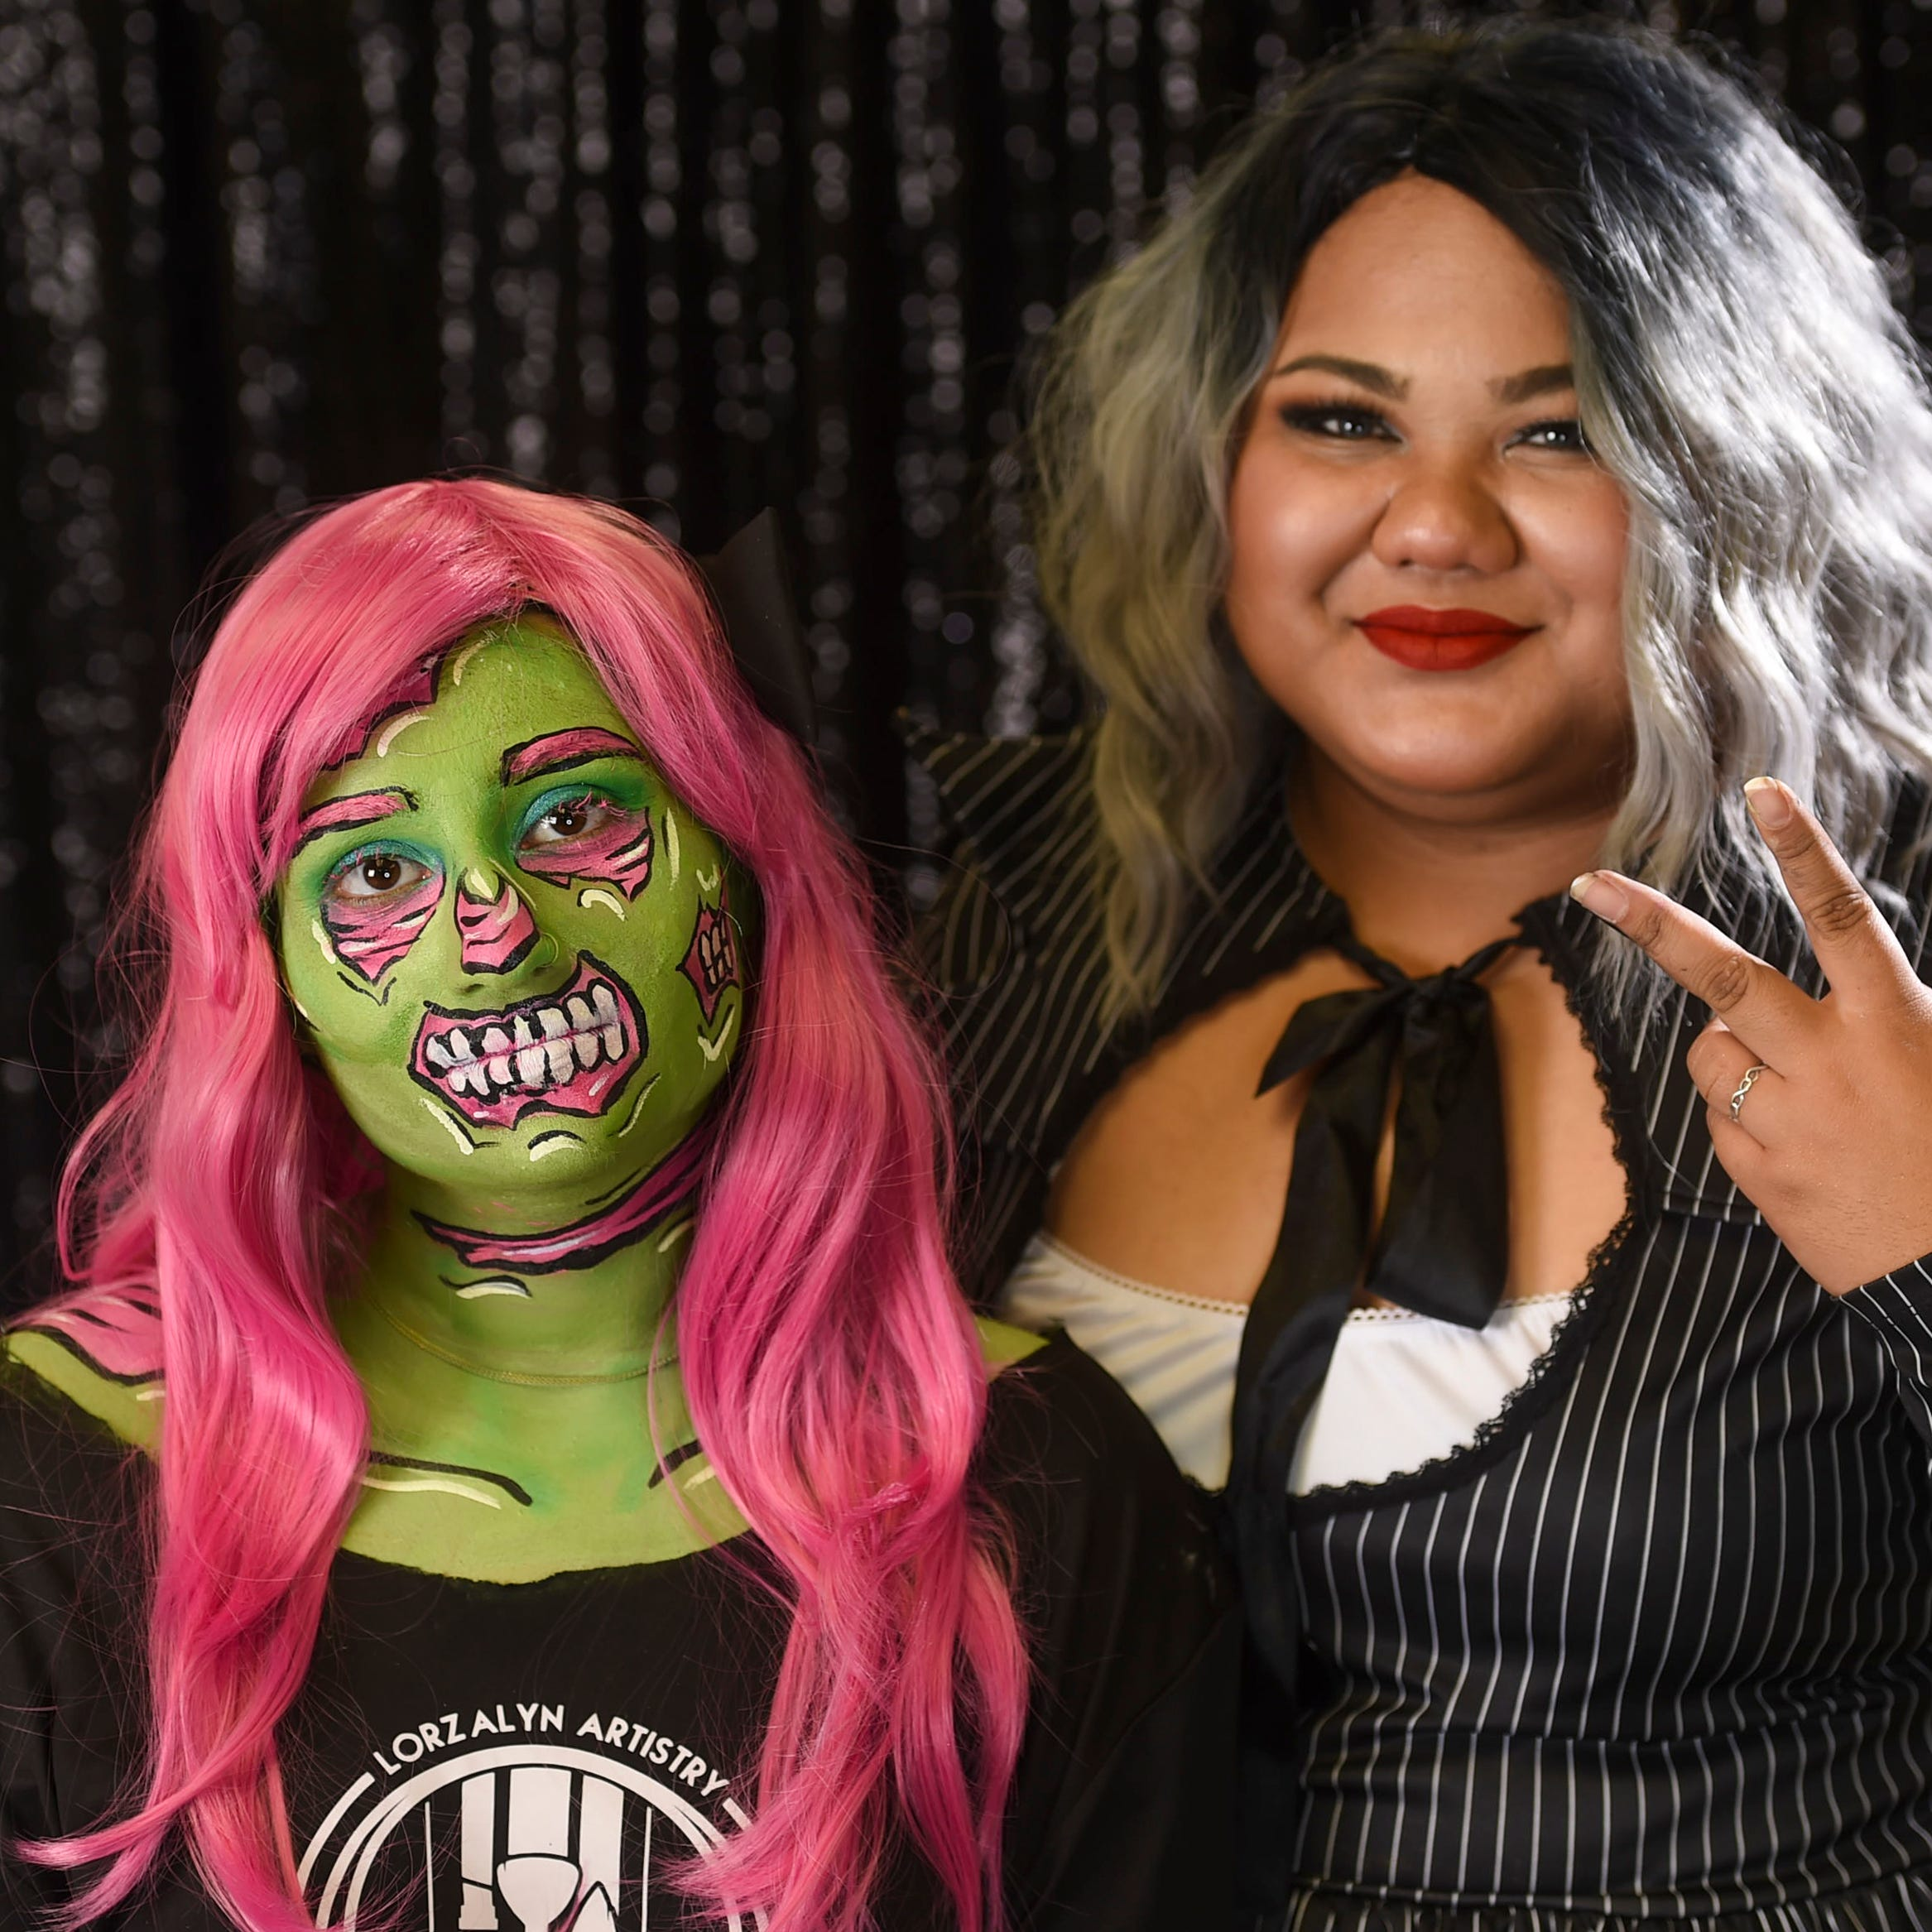 New fun, spooky DIY looks for Halloween